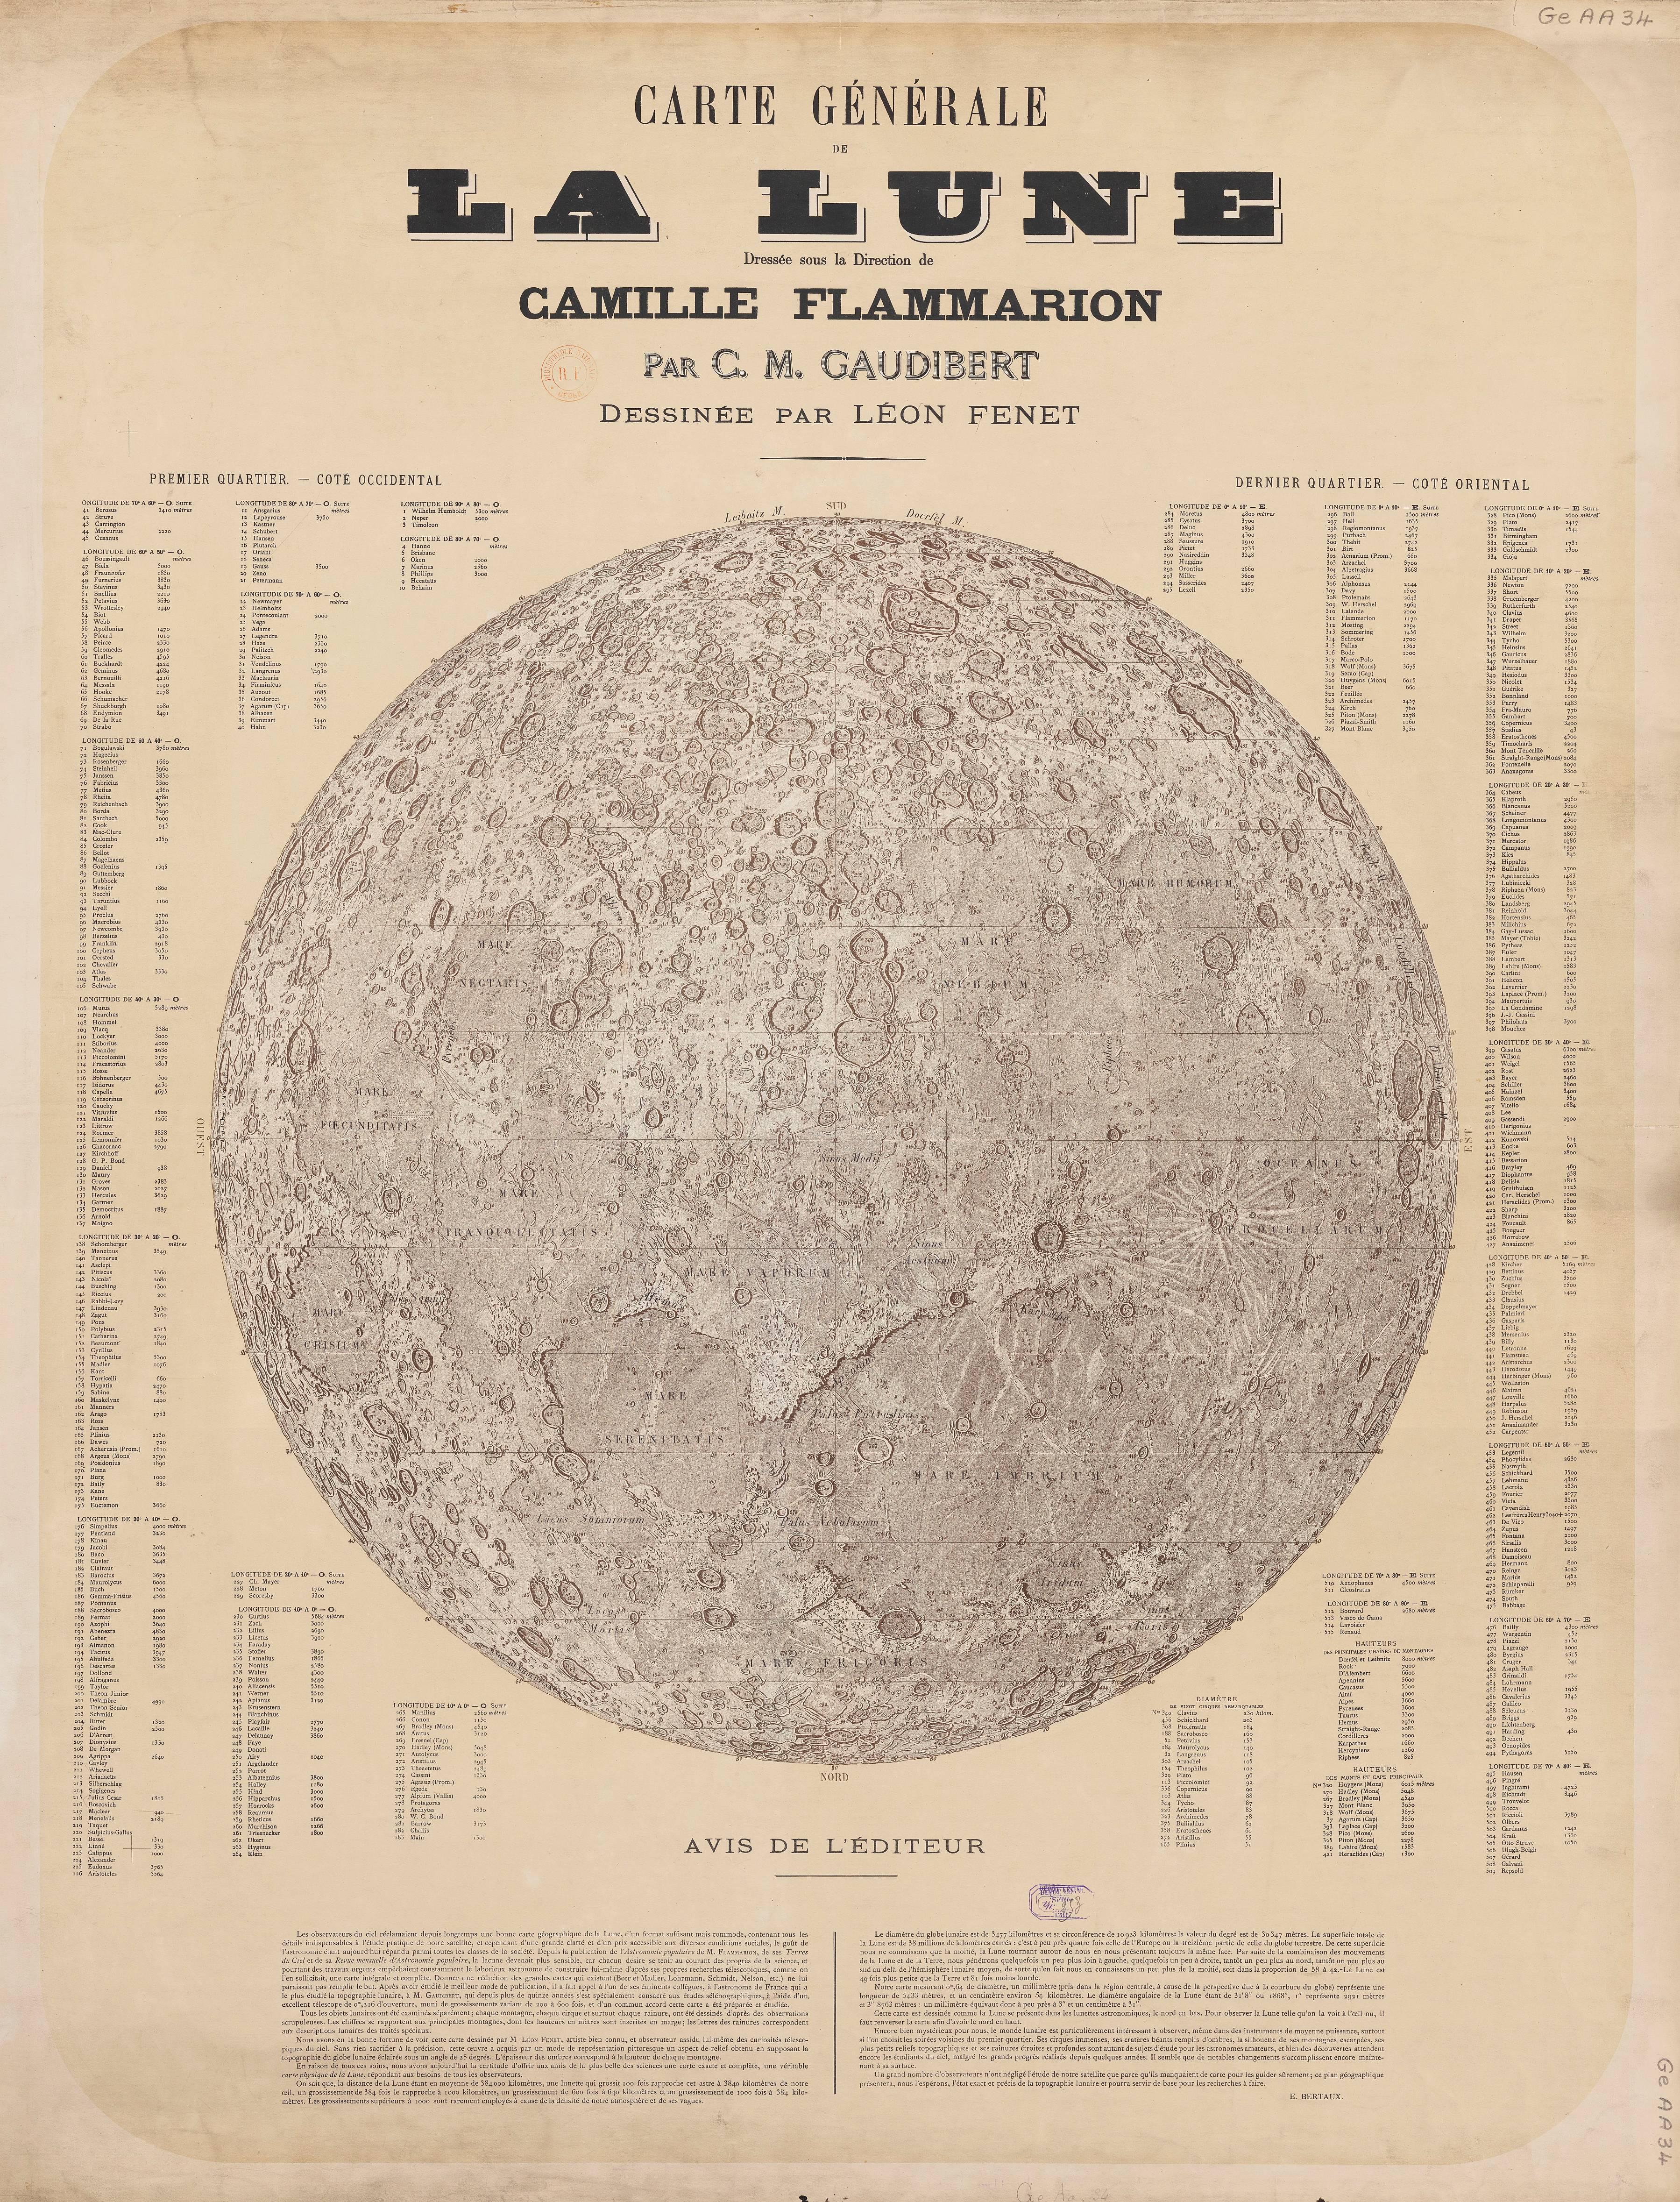 Flammarion_Moon_1887.jpg